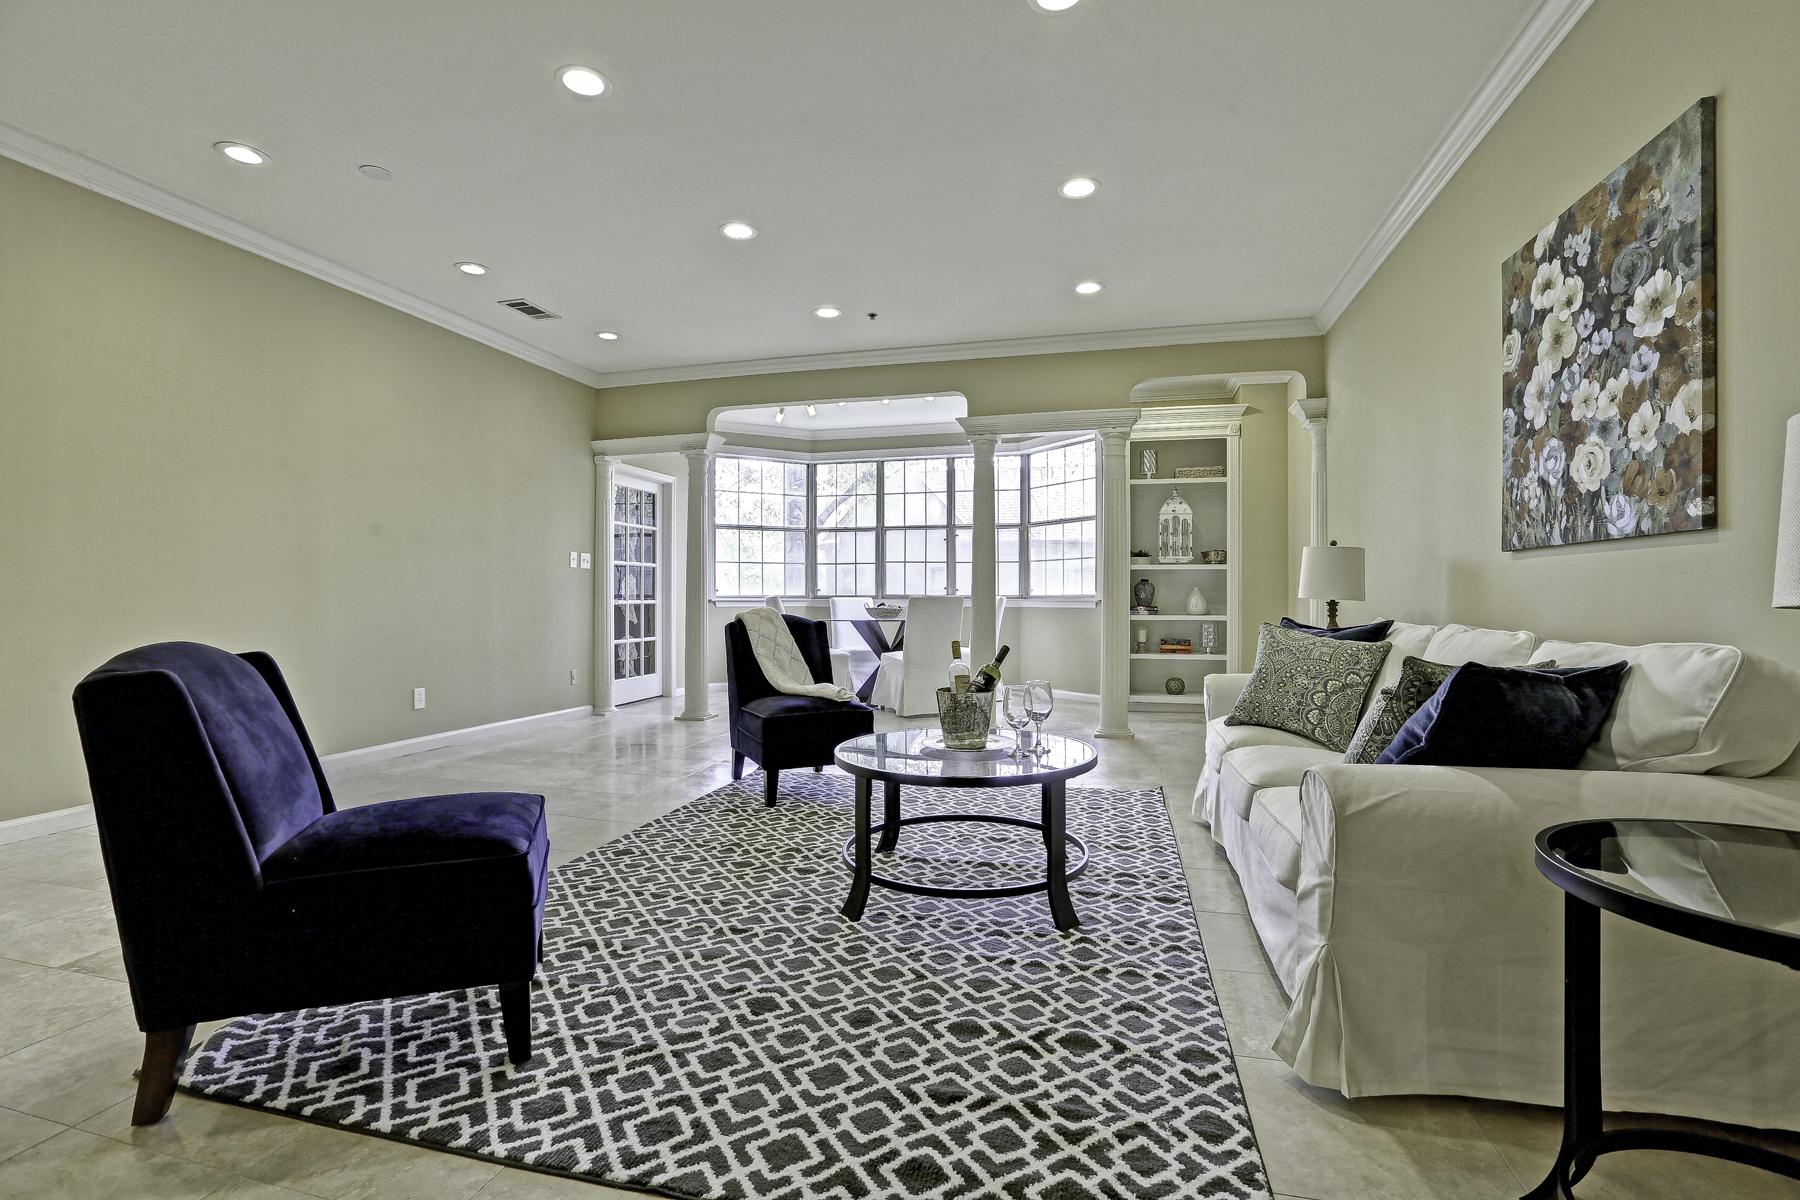 Nhà chung cư vì Bán tại Spacious Light-filled Upgraded Condo With Timeless Elegance 2499 Peachtree Road NE Unit 201 Atlanta, Georgia, 30305 Hoa Kỳ